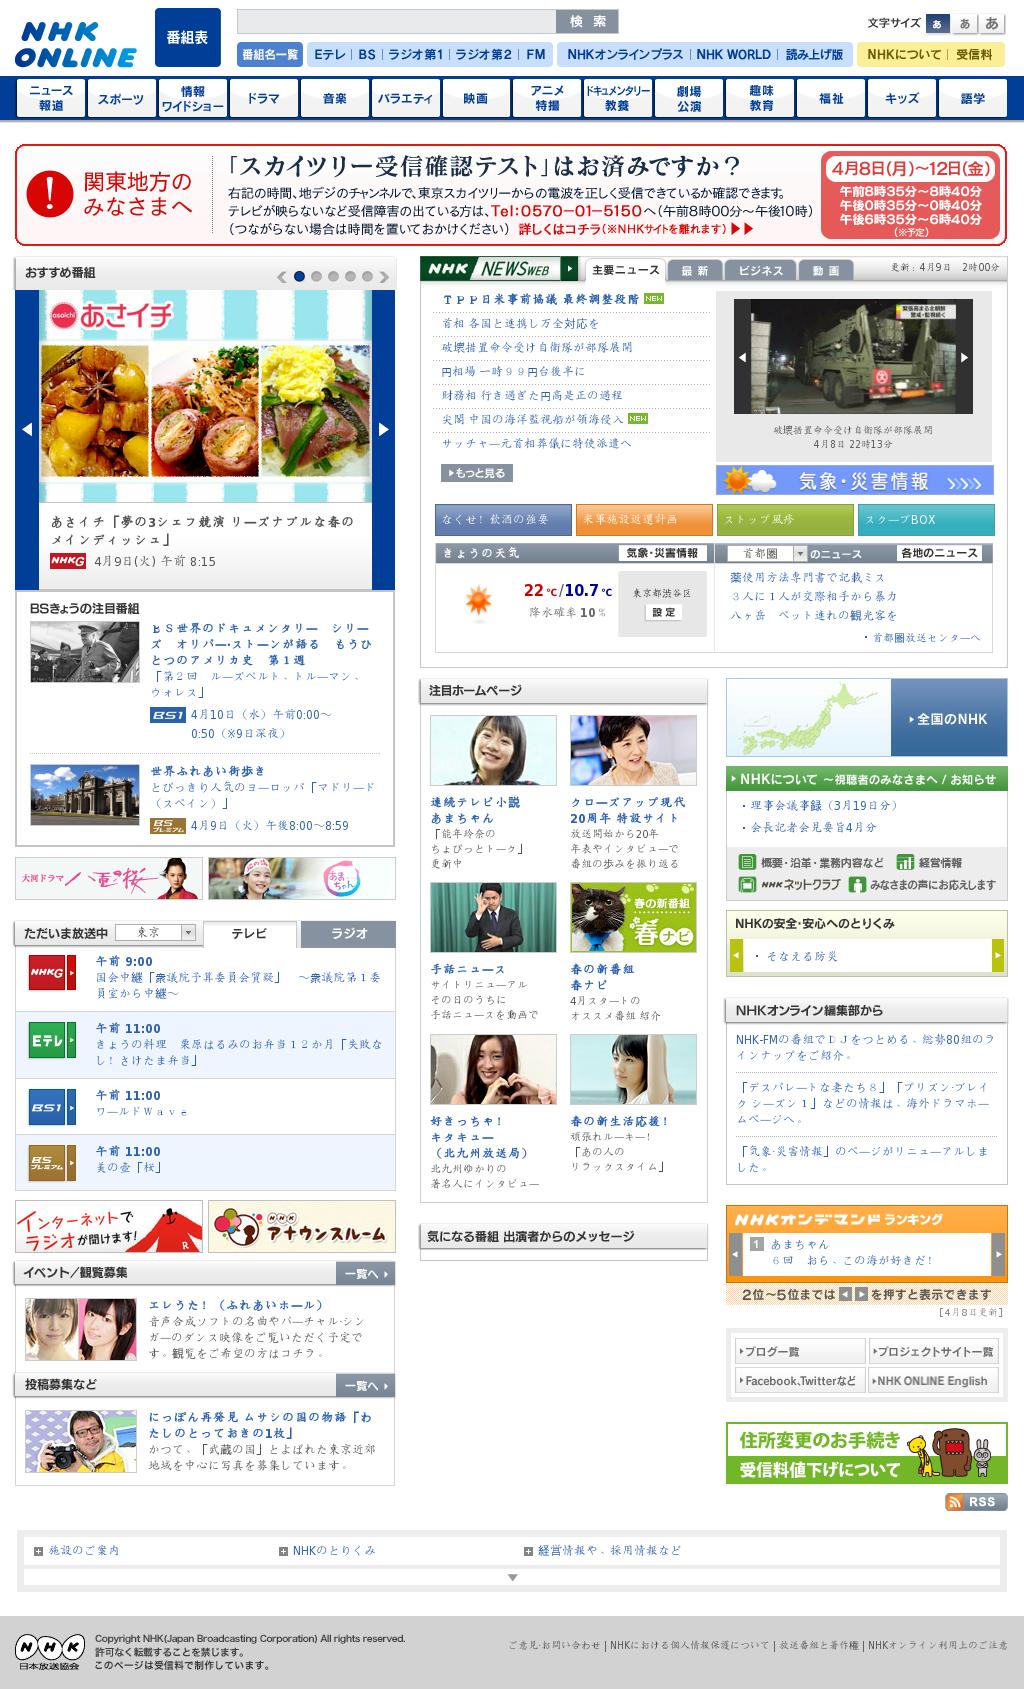 NHK Online at Tuesday April 9, 2013, 2:17 a.m. UTC